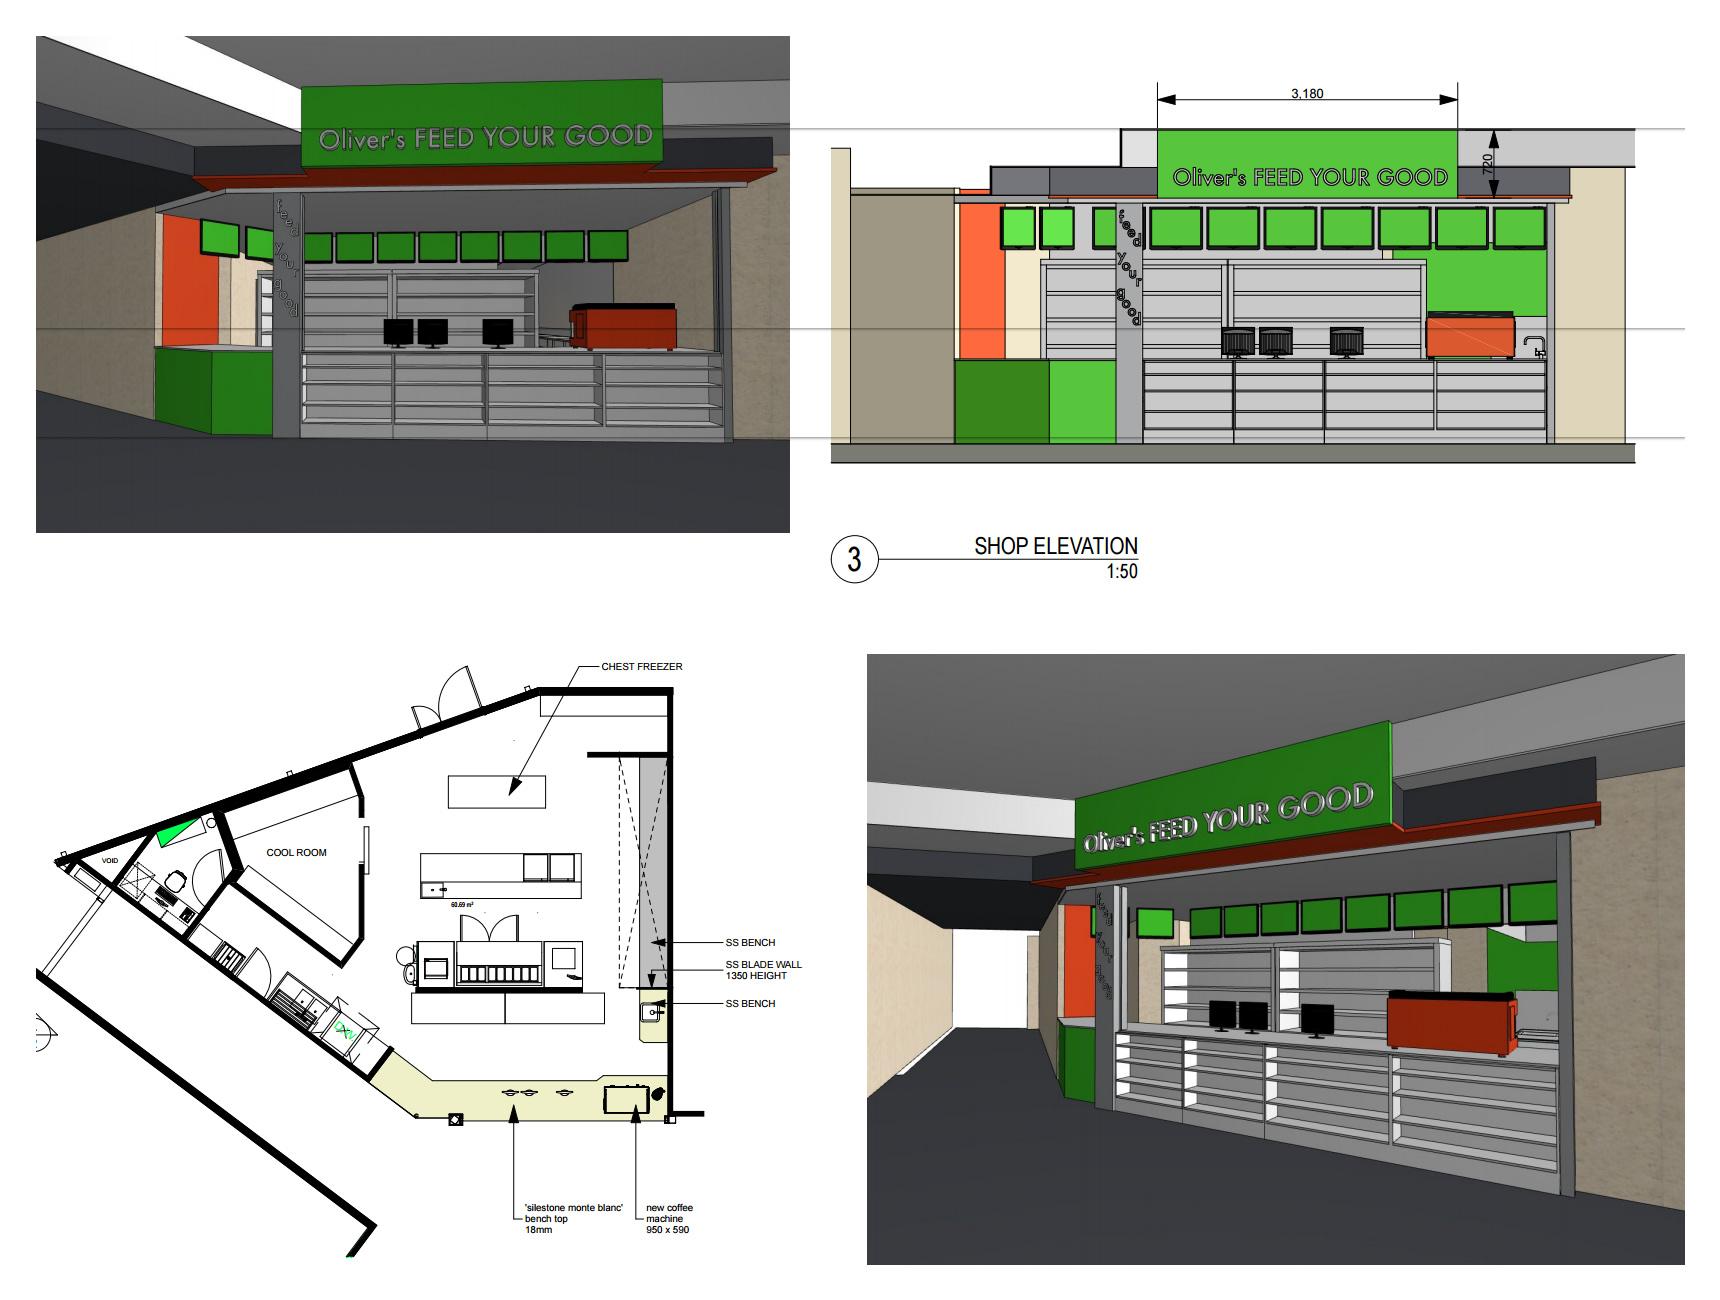 Oliver's Store Design